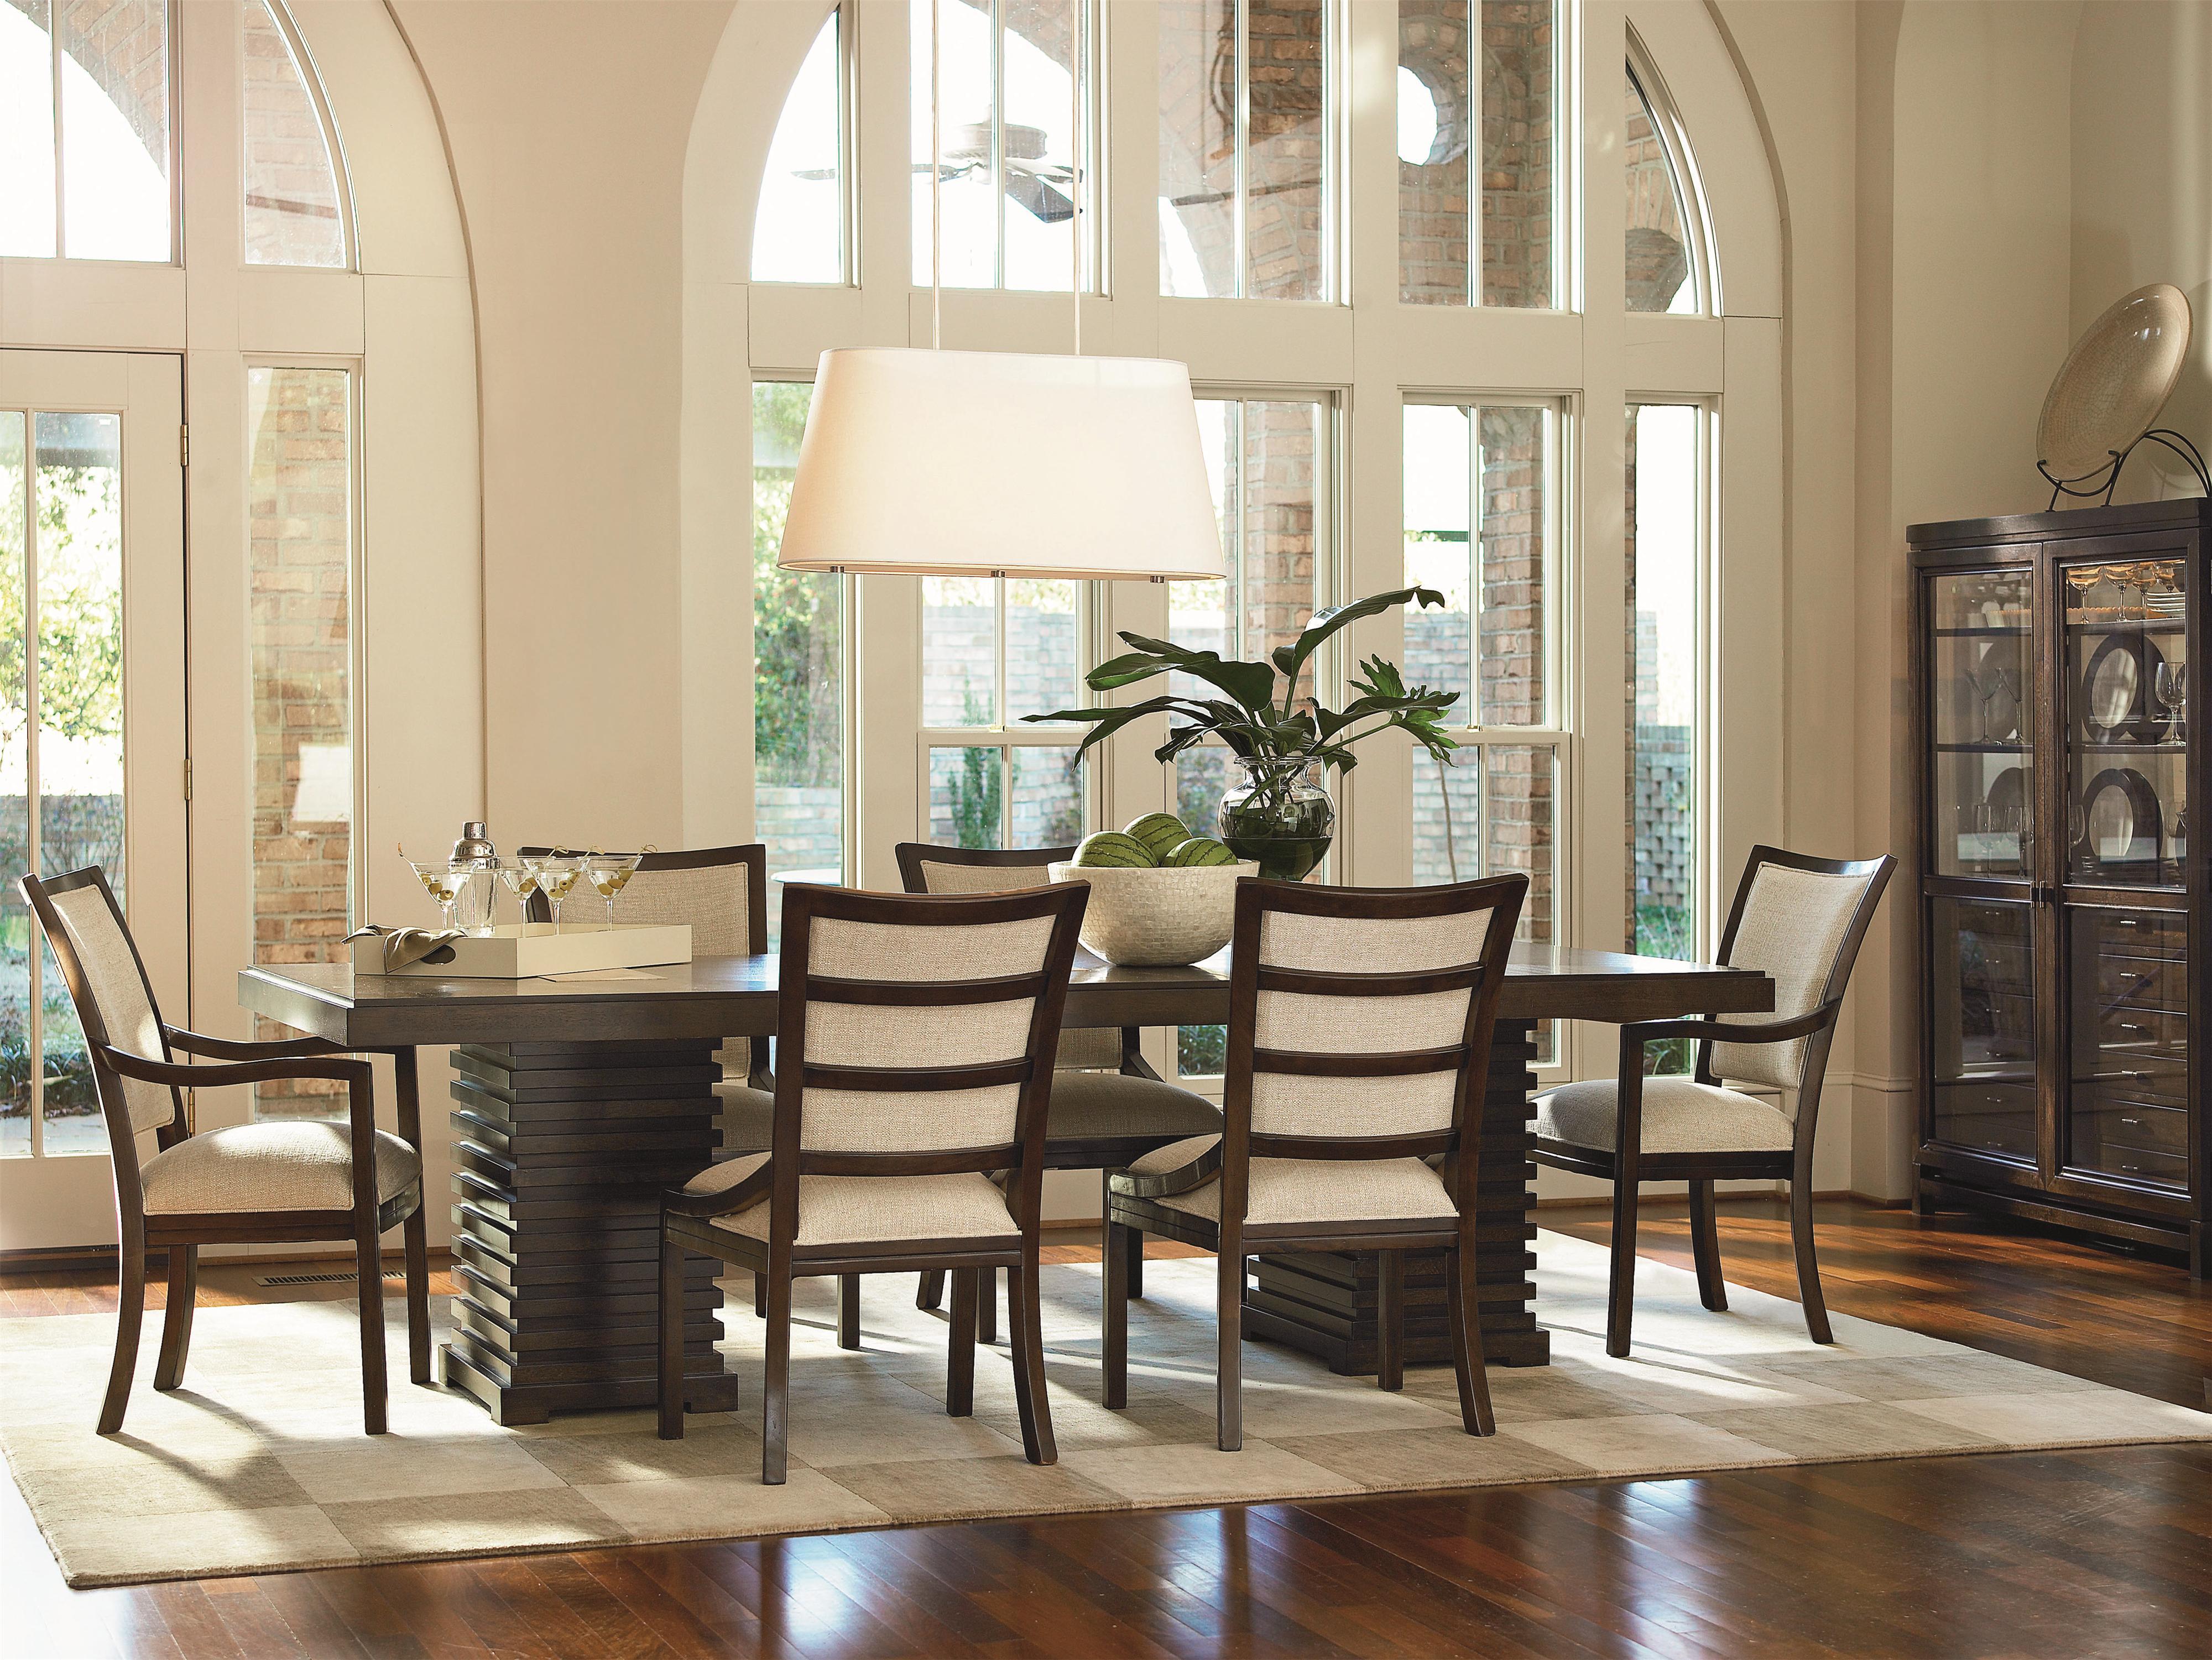 Latitude 113 By Universal Baer S Furniture Universal